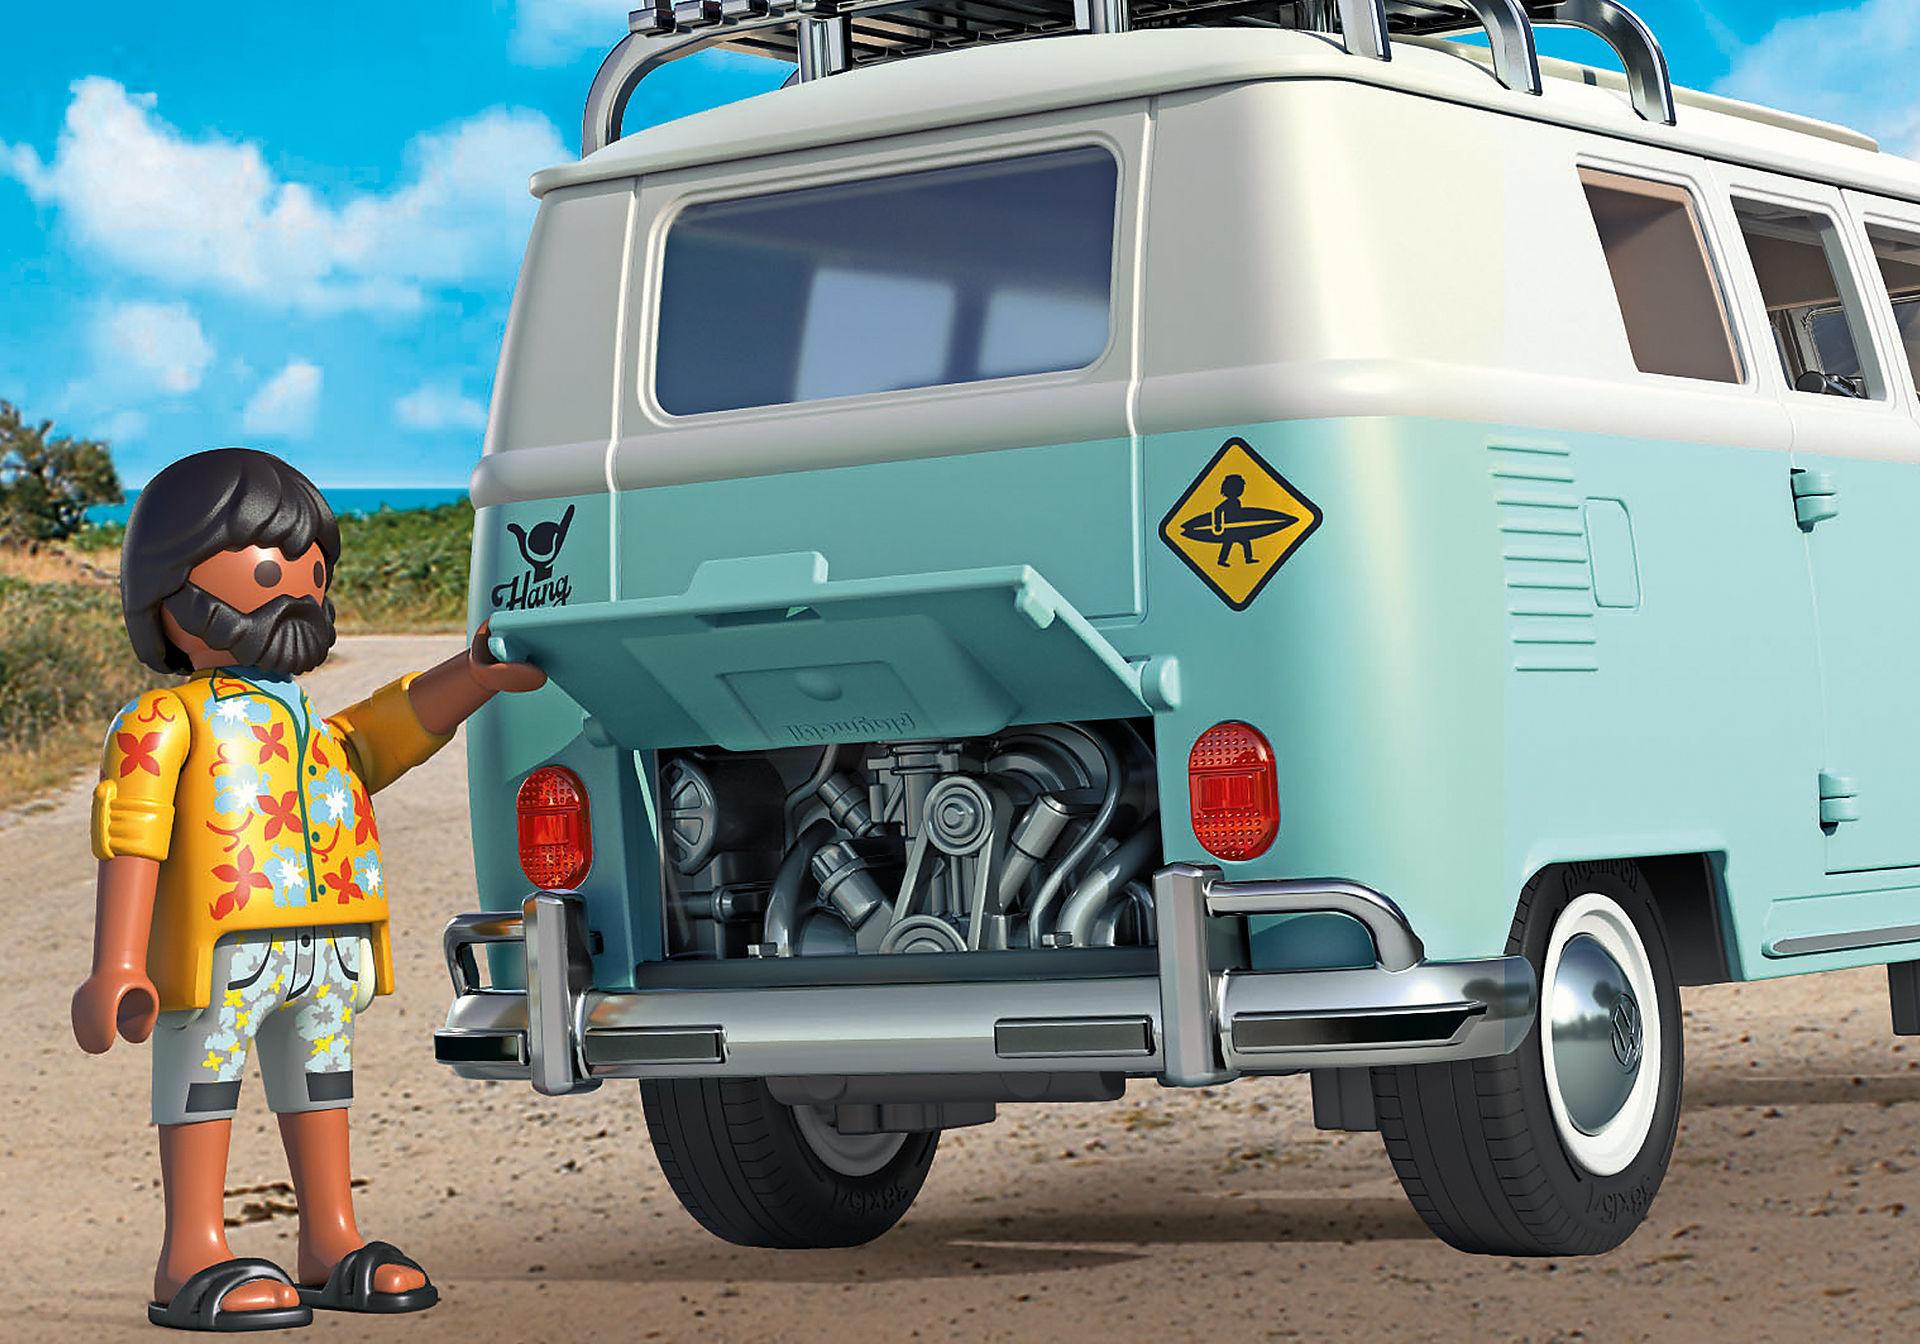 70826 Volkswagen T1 Camping Bus - Edycja specjalna zoom image9